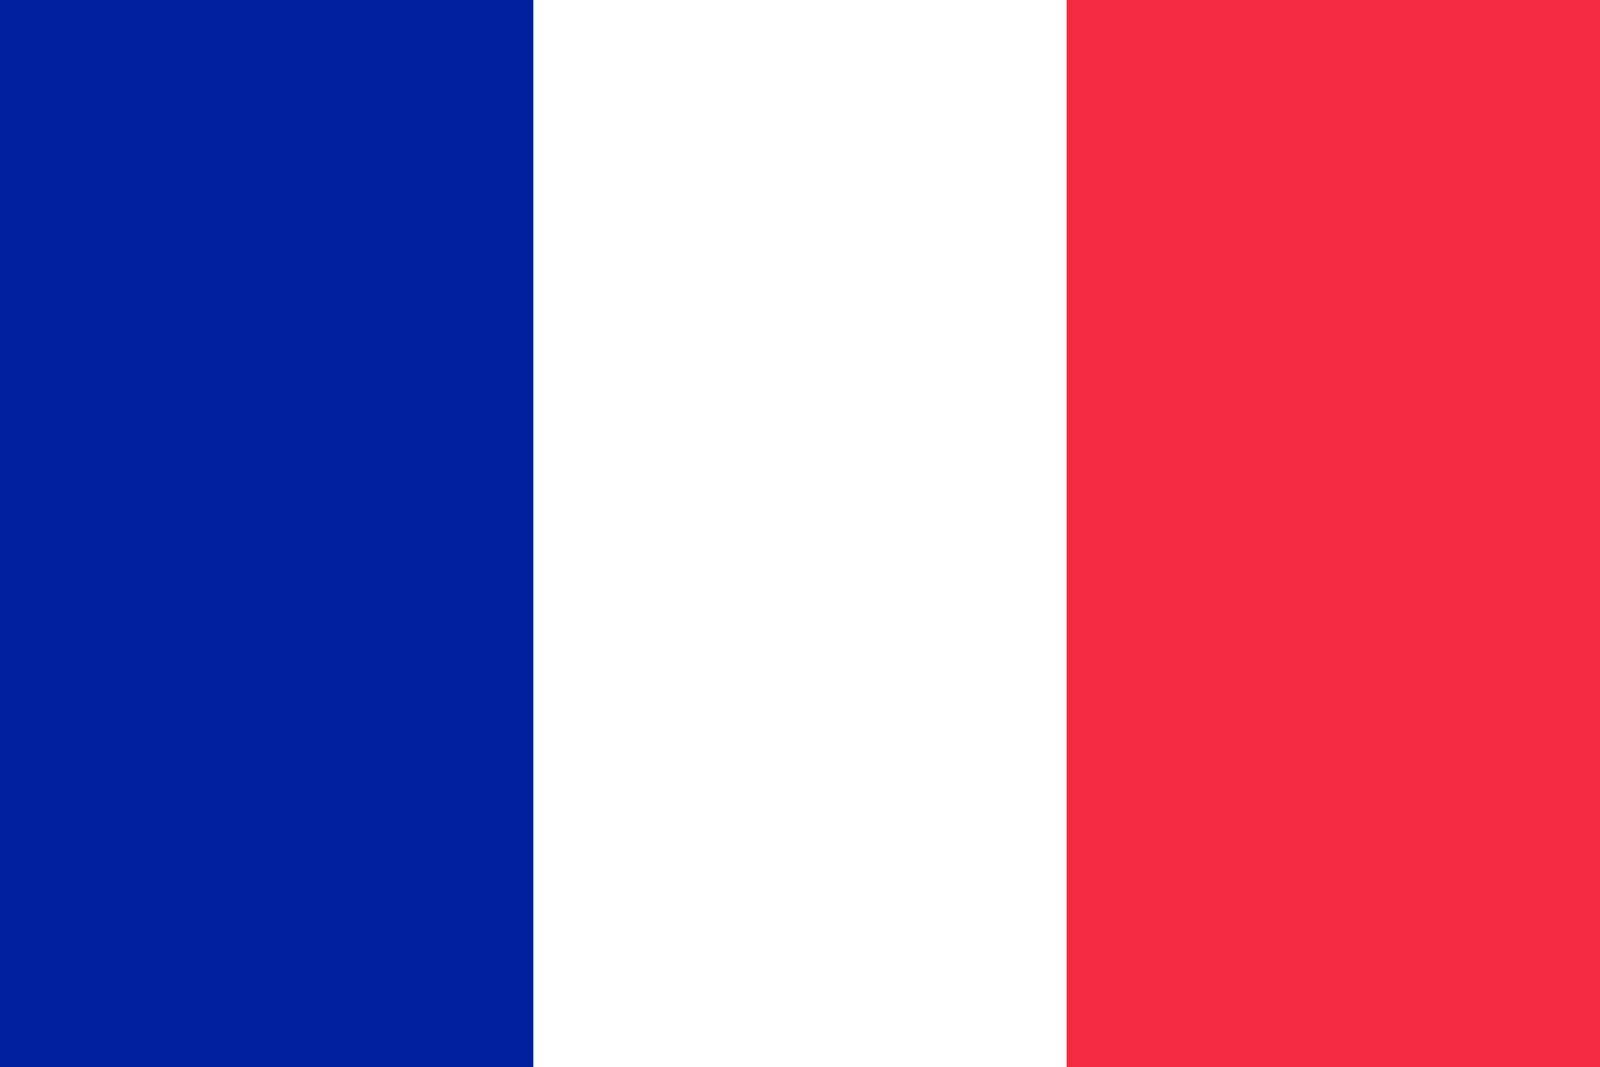 Mistik Kita Soal Latihan Dasar Bahasa Prancis